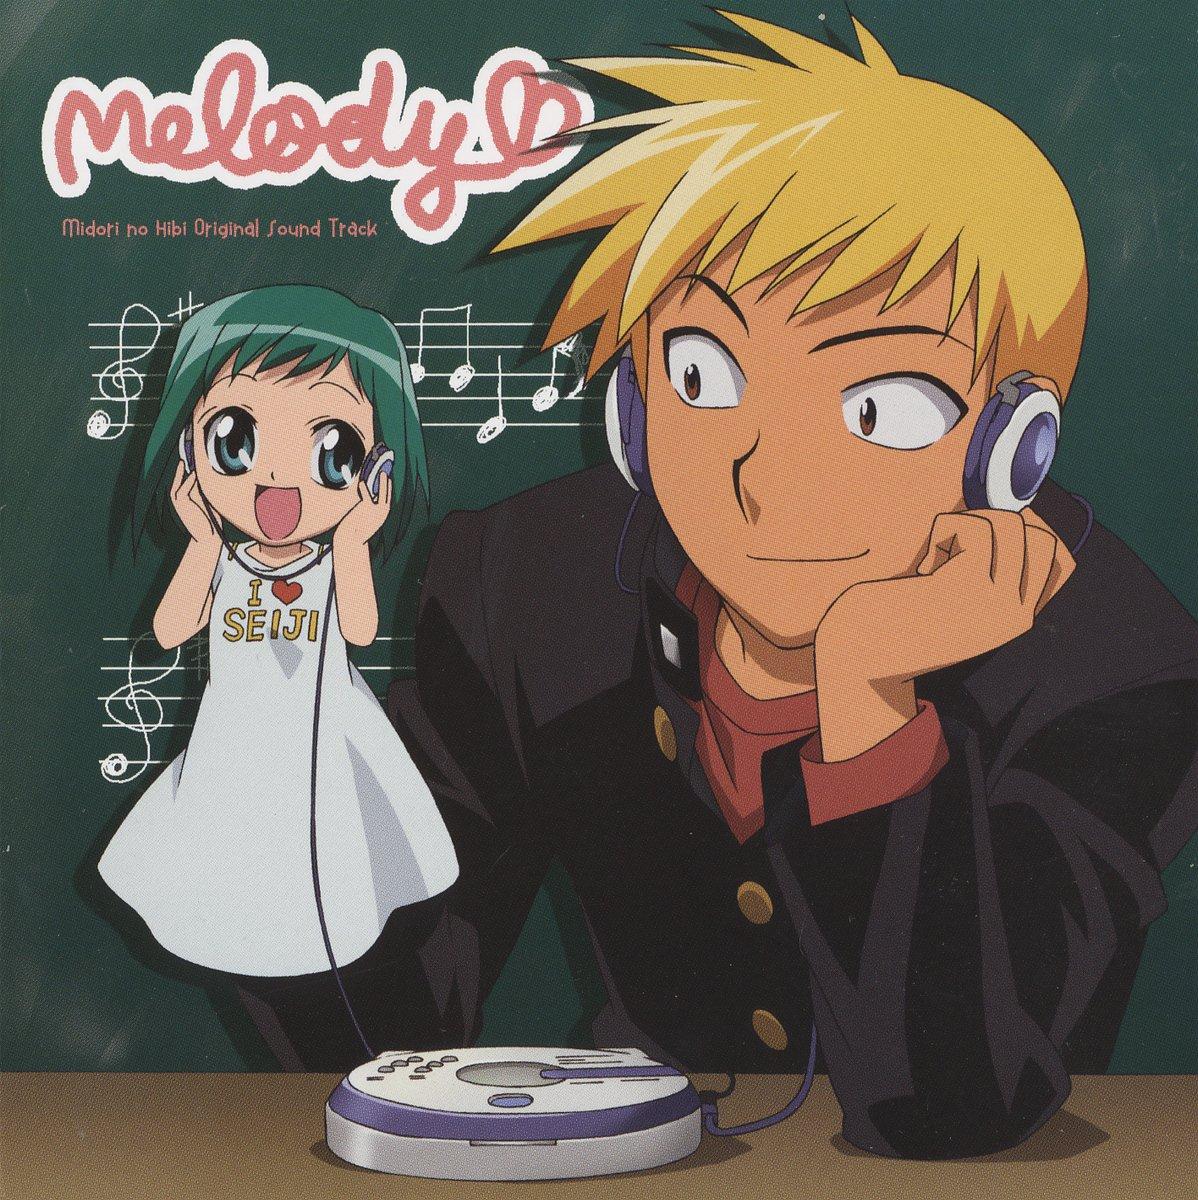 Anime Terbaik: Rekomendasi Anime Terbaik: 25 Rekomendasi Anime School Terbaik